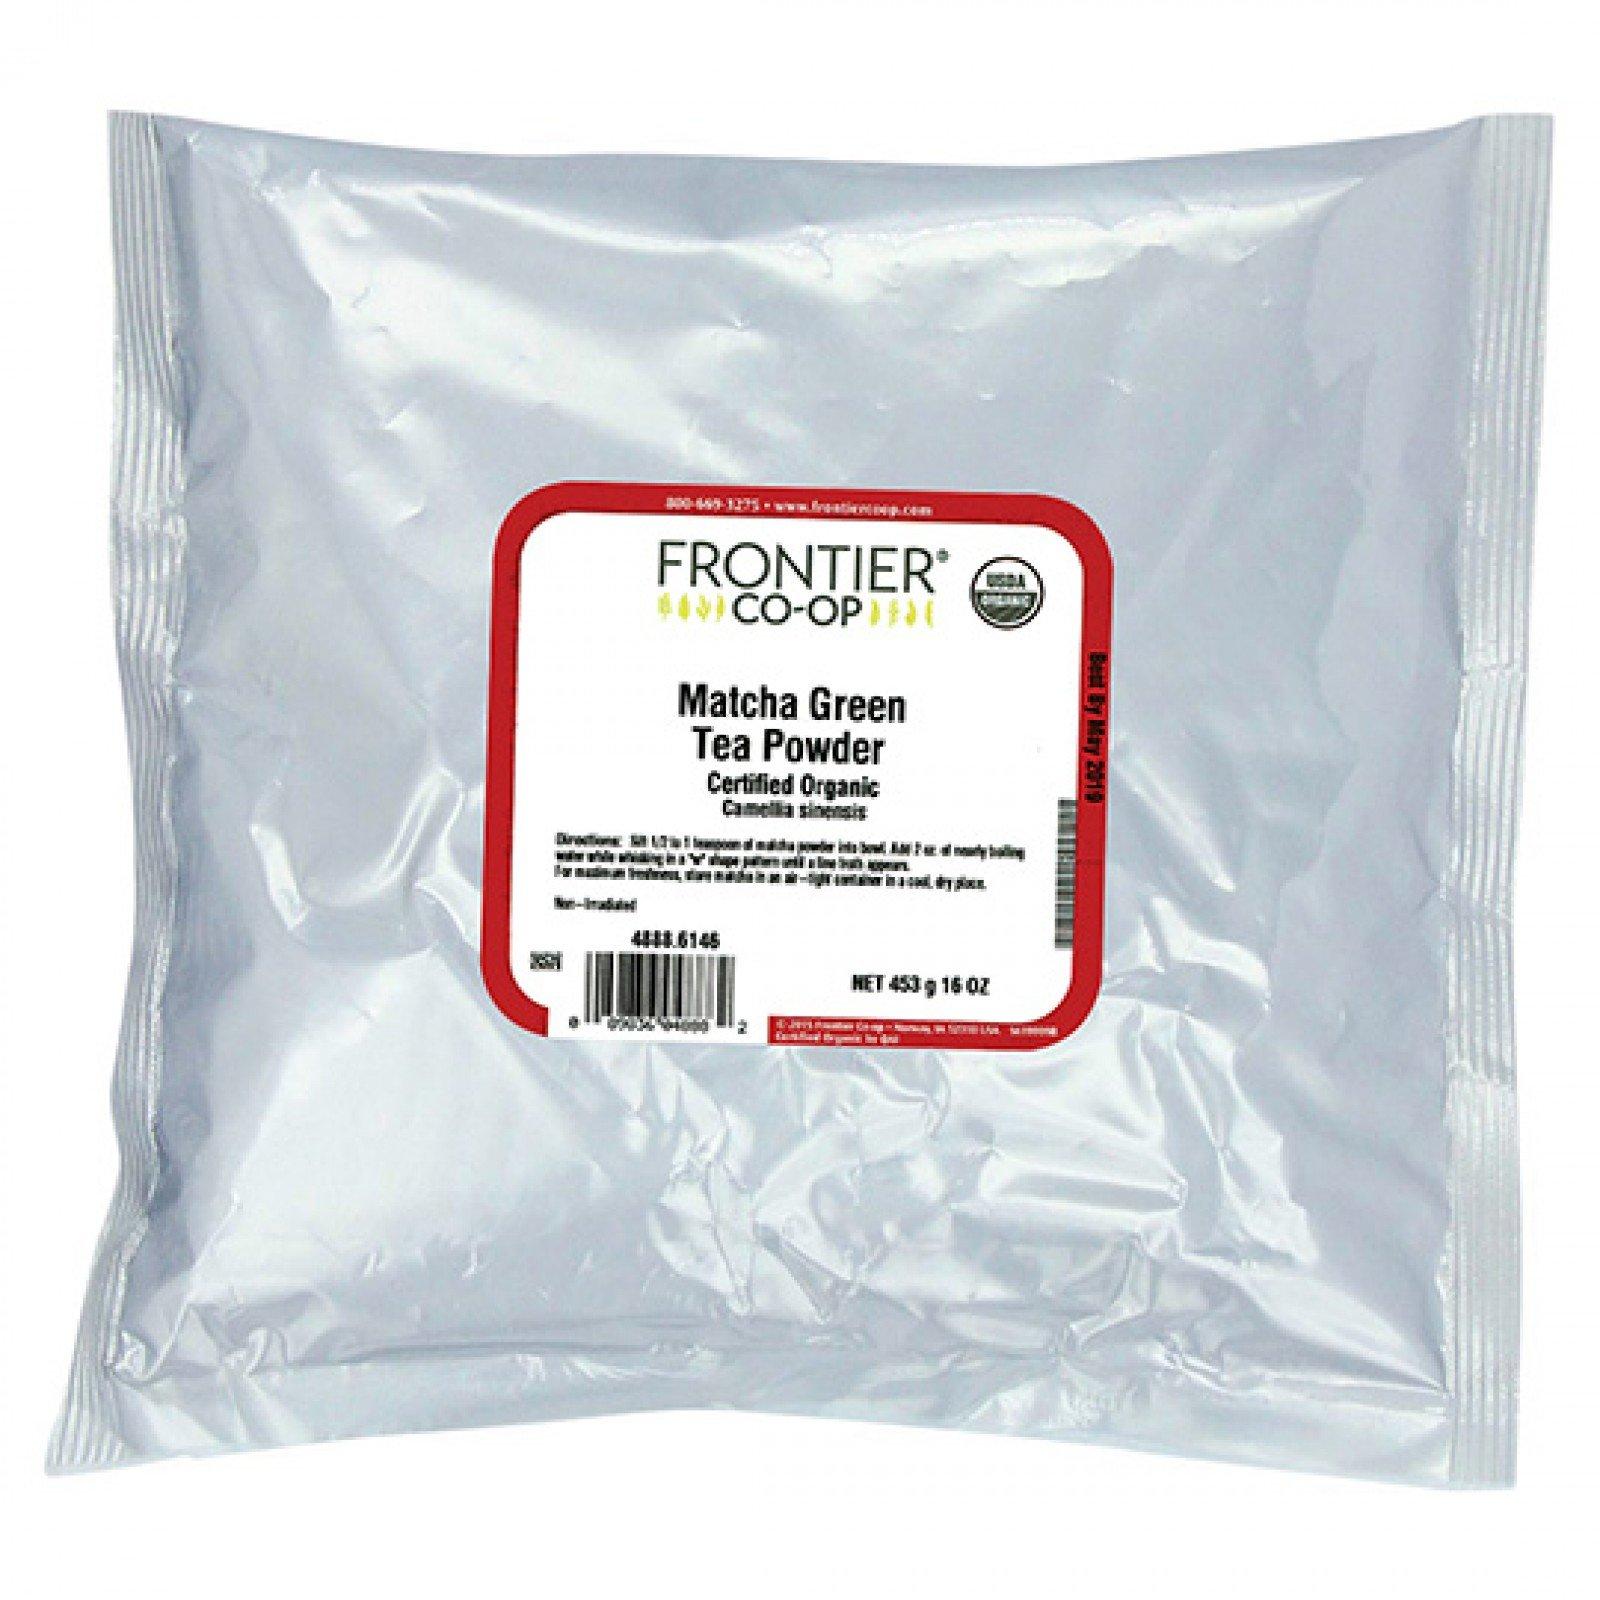 Frontier Bulk Matcha Green Tea Powder, ORGANIC, 1 lb. package